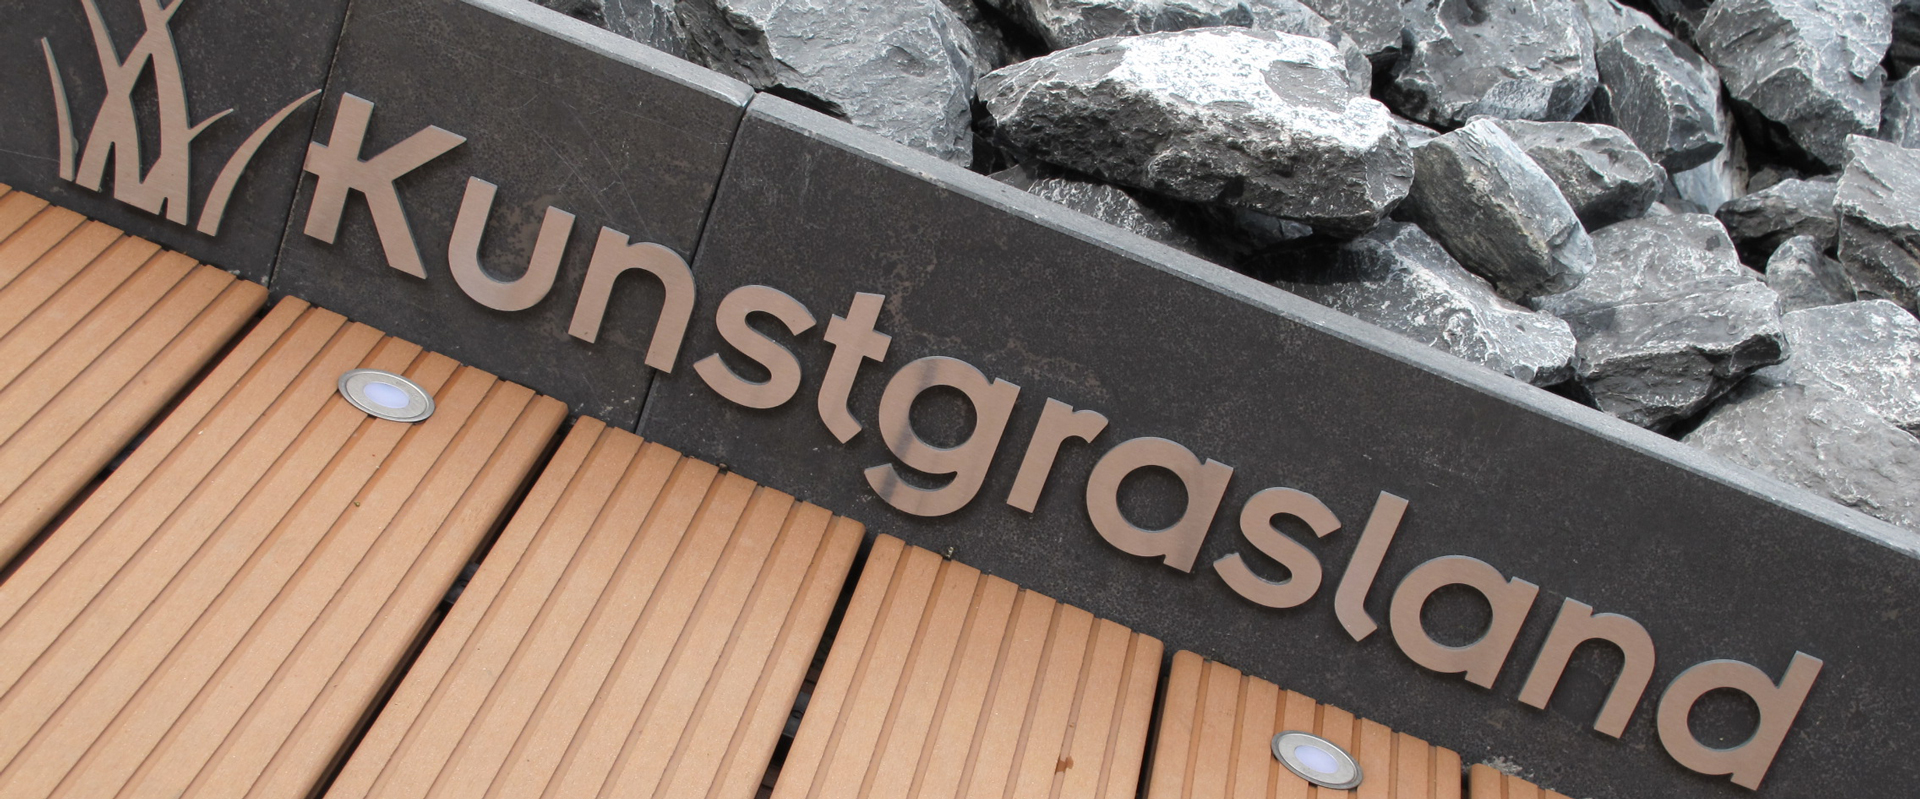 Kunstgrasland service